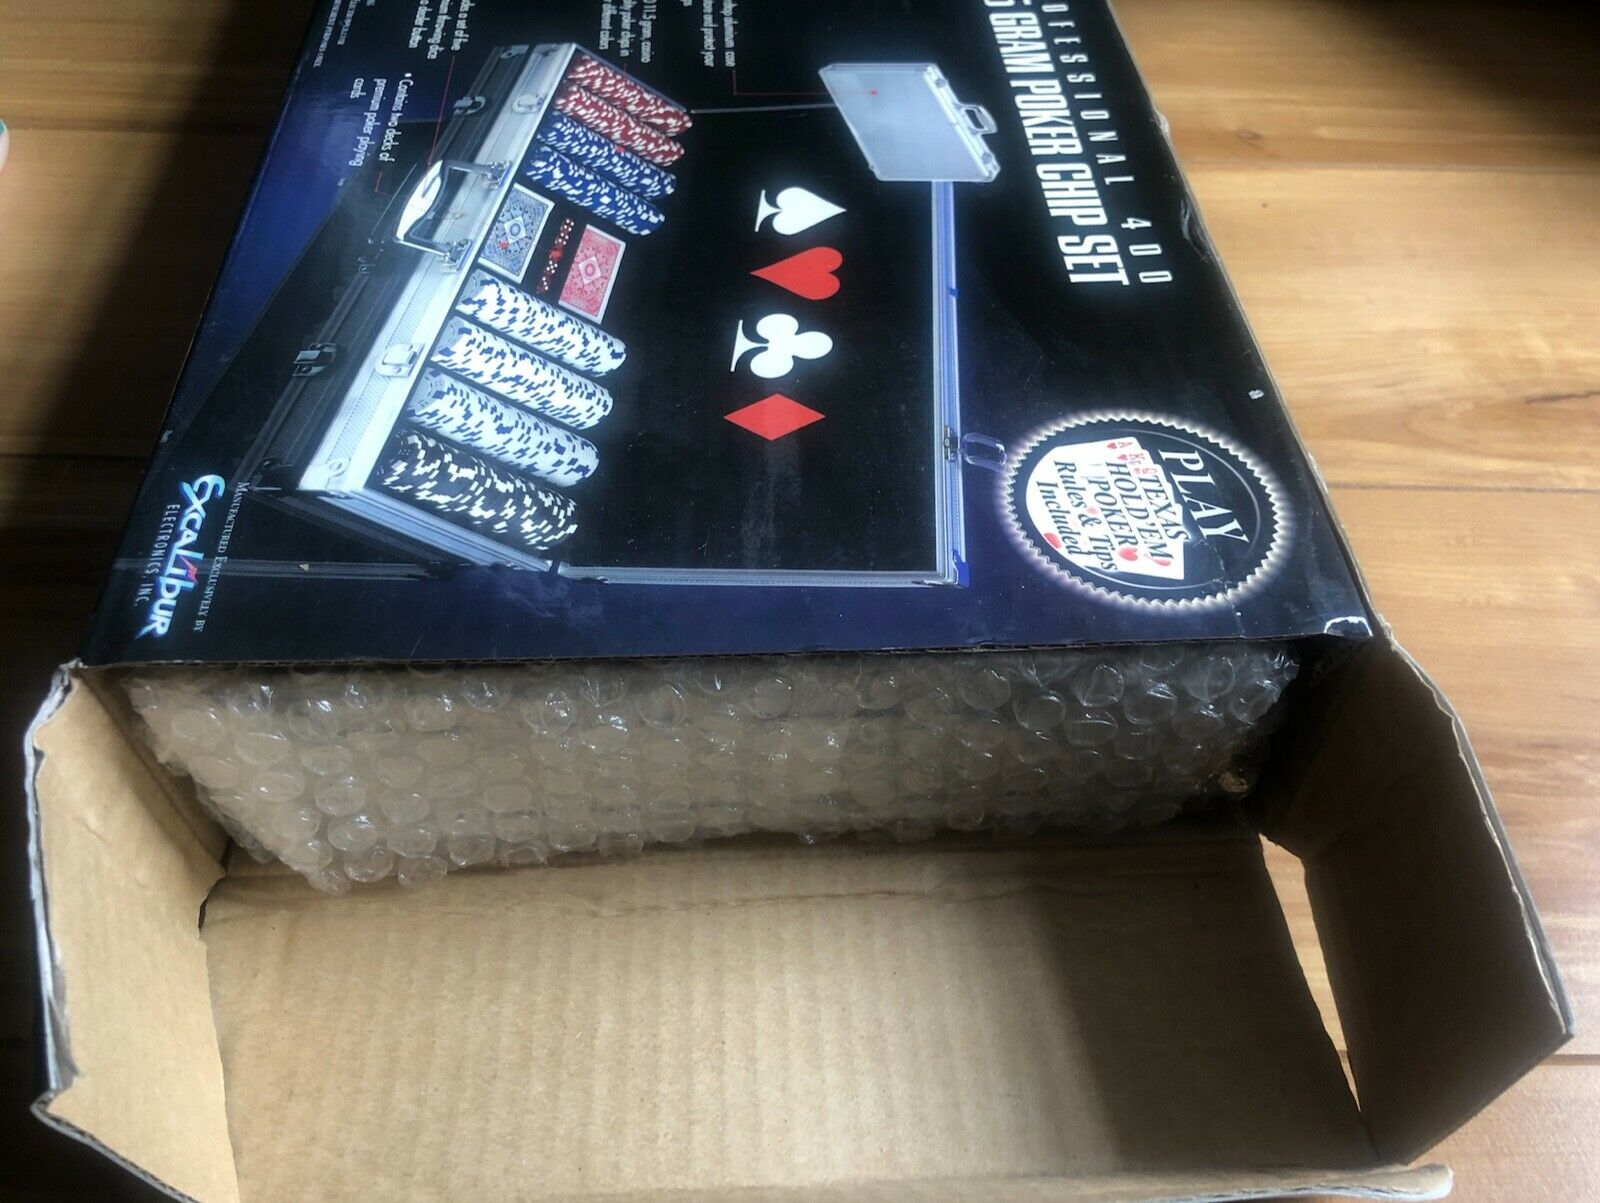 Excalibur Electronics Professional 400 115 Gram Poker Chip Set